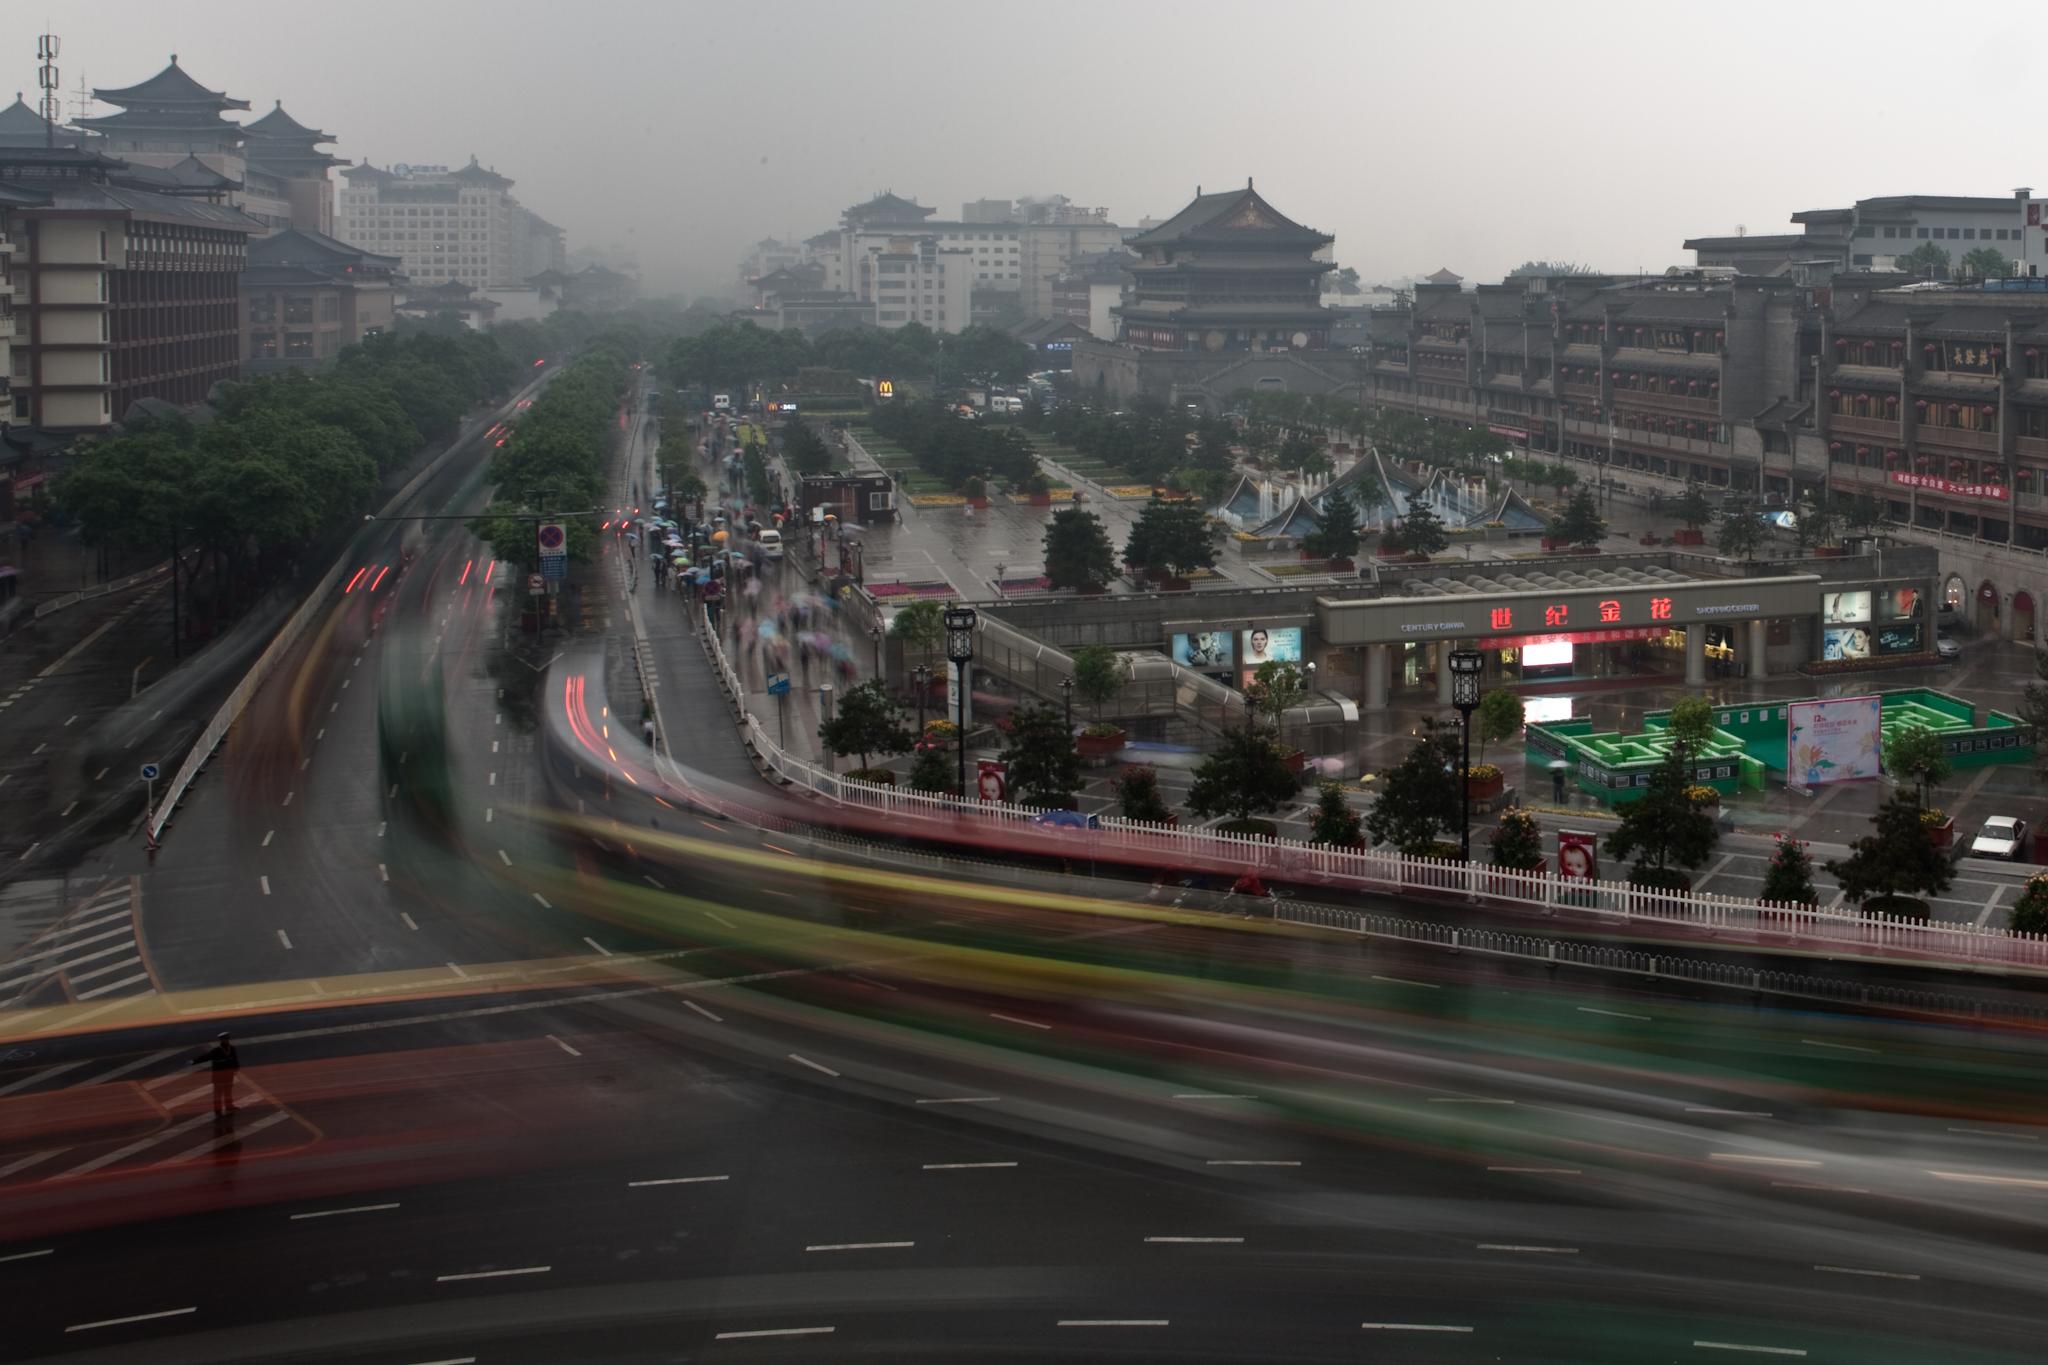 Ancient Capital Of China Bilgisayar Duvar Kağıtları